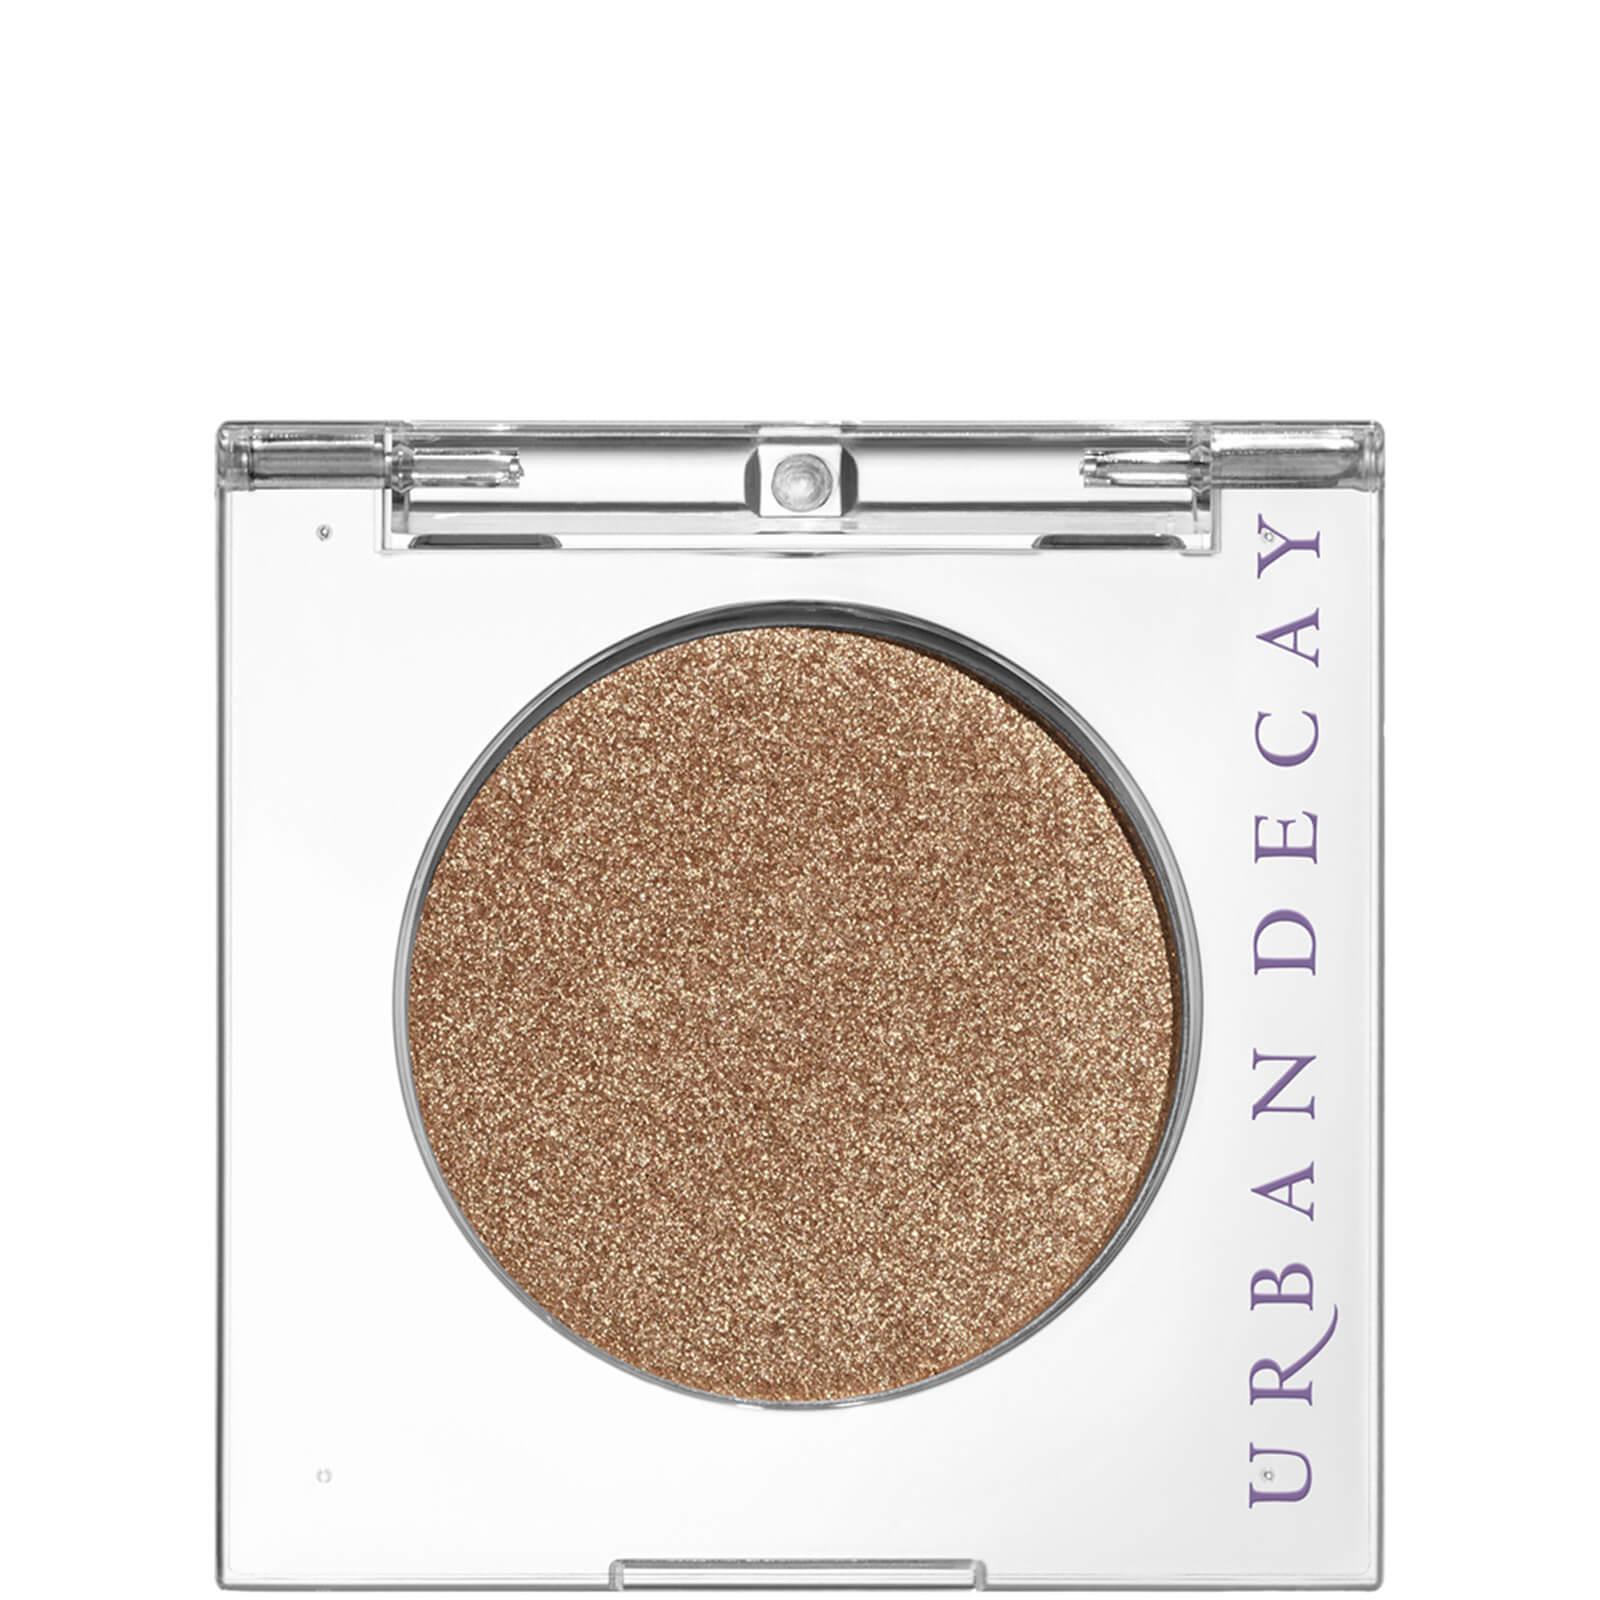 Купить Urban Decay 24/7 Eyeshadow Mono Moondust (Various Shades) - Half Baked